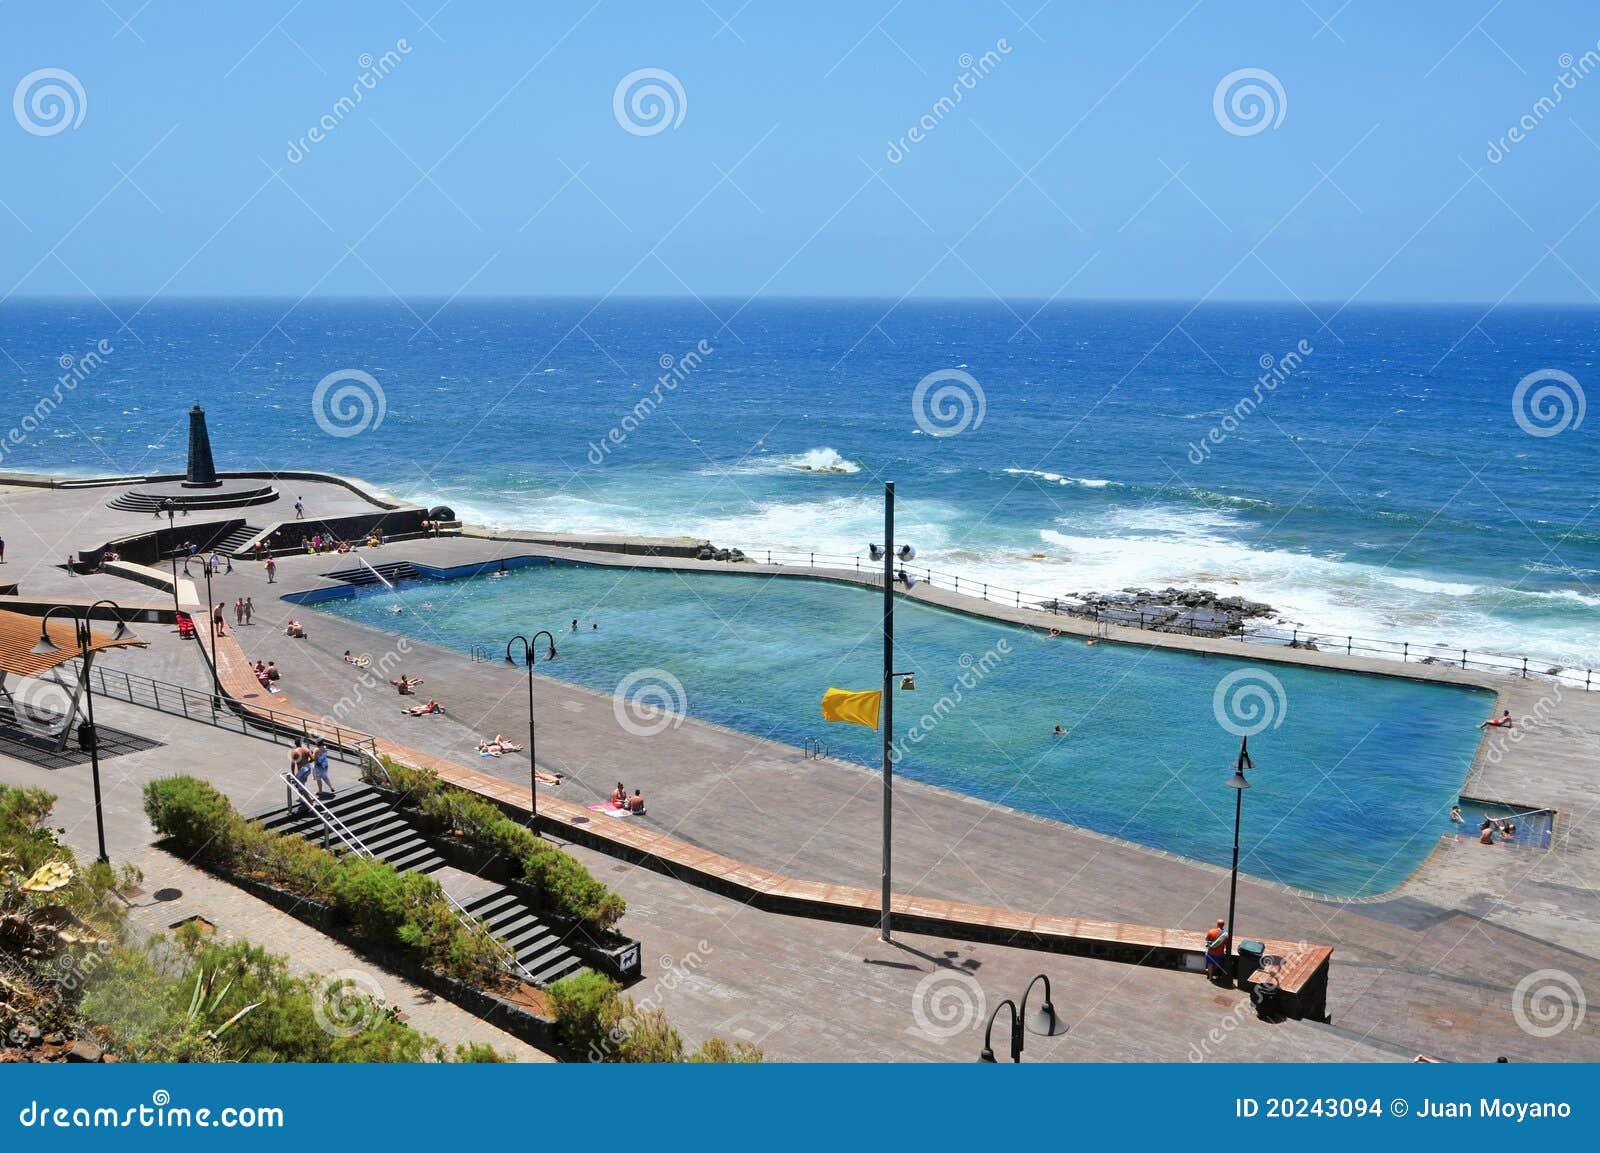 Piscine d 39 eau de mer dans bajamar tenerife espagne image - Piscine martianez tenerife ...